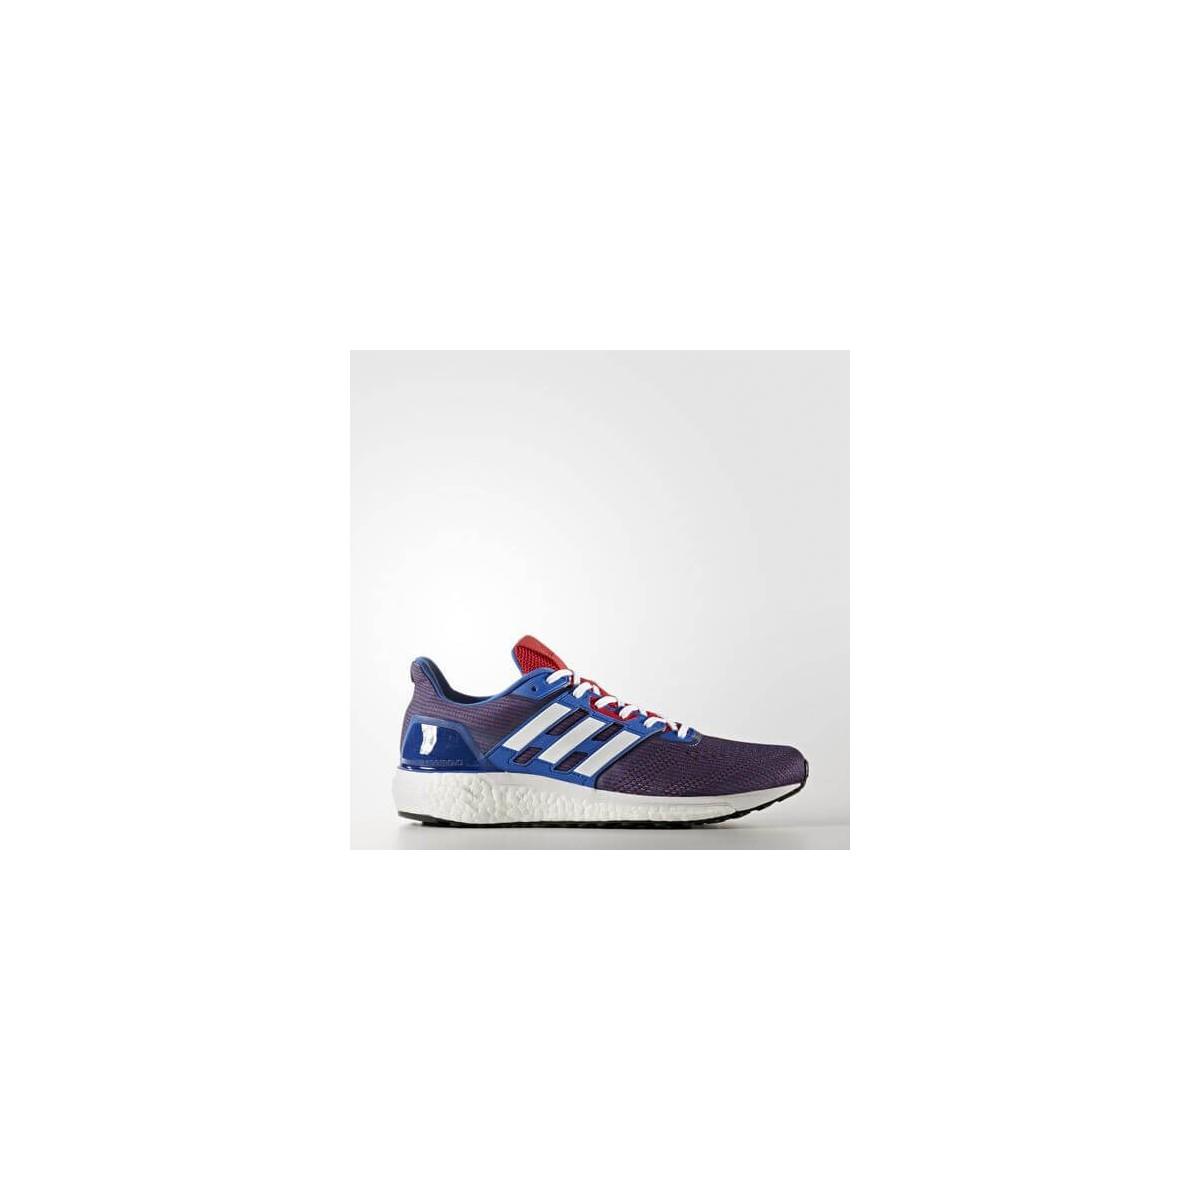 Zapatillas Adidas rojo y running azul Hombre Supernova OI17 clFJT13K